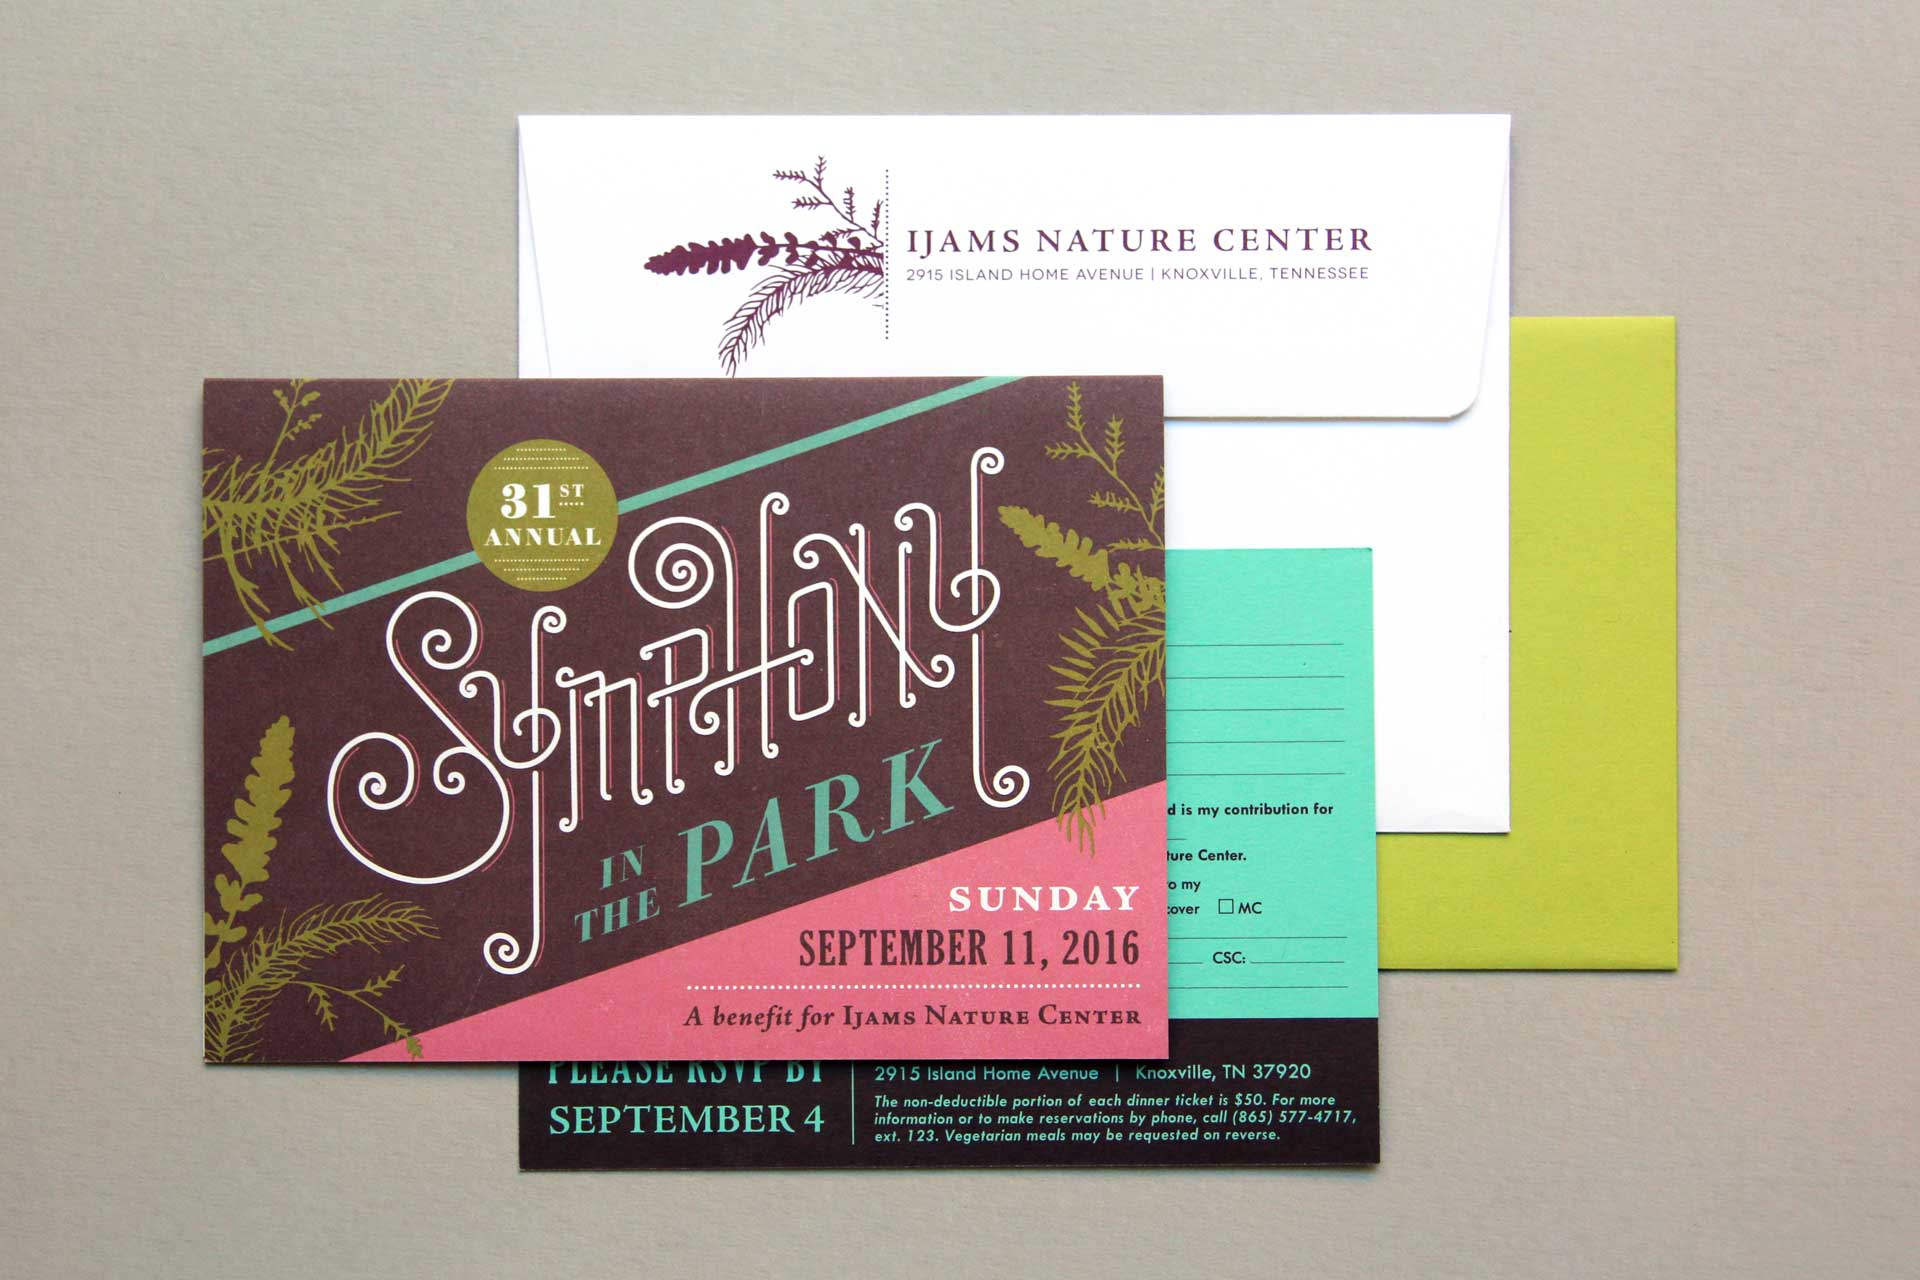 Ijams Nature Center Symphony In the Park invitation